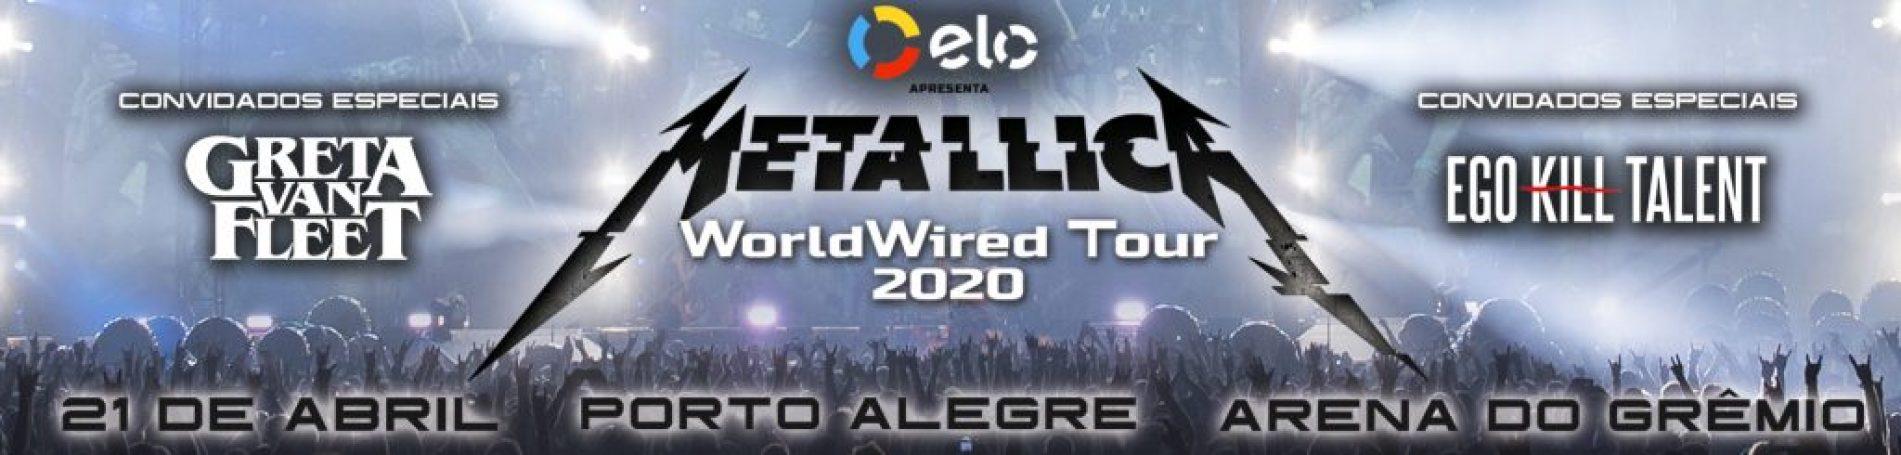 Metallica_1920 x 455